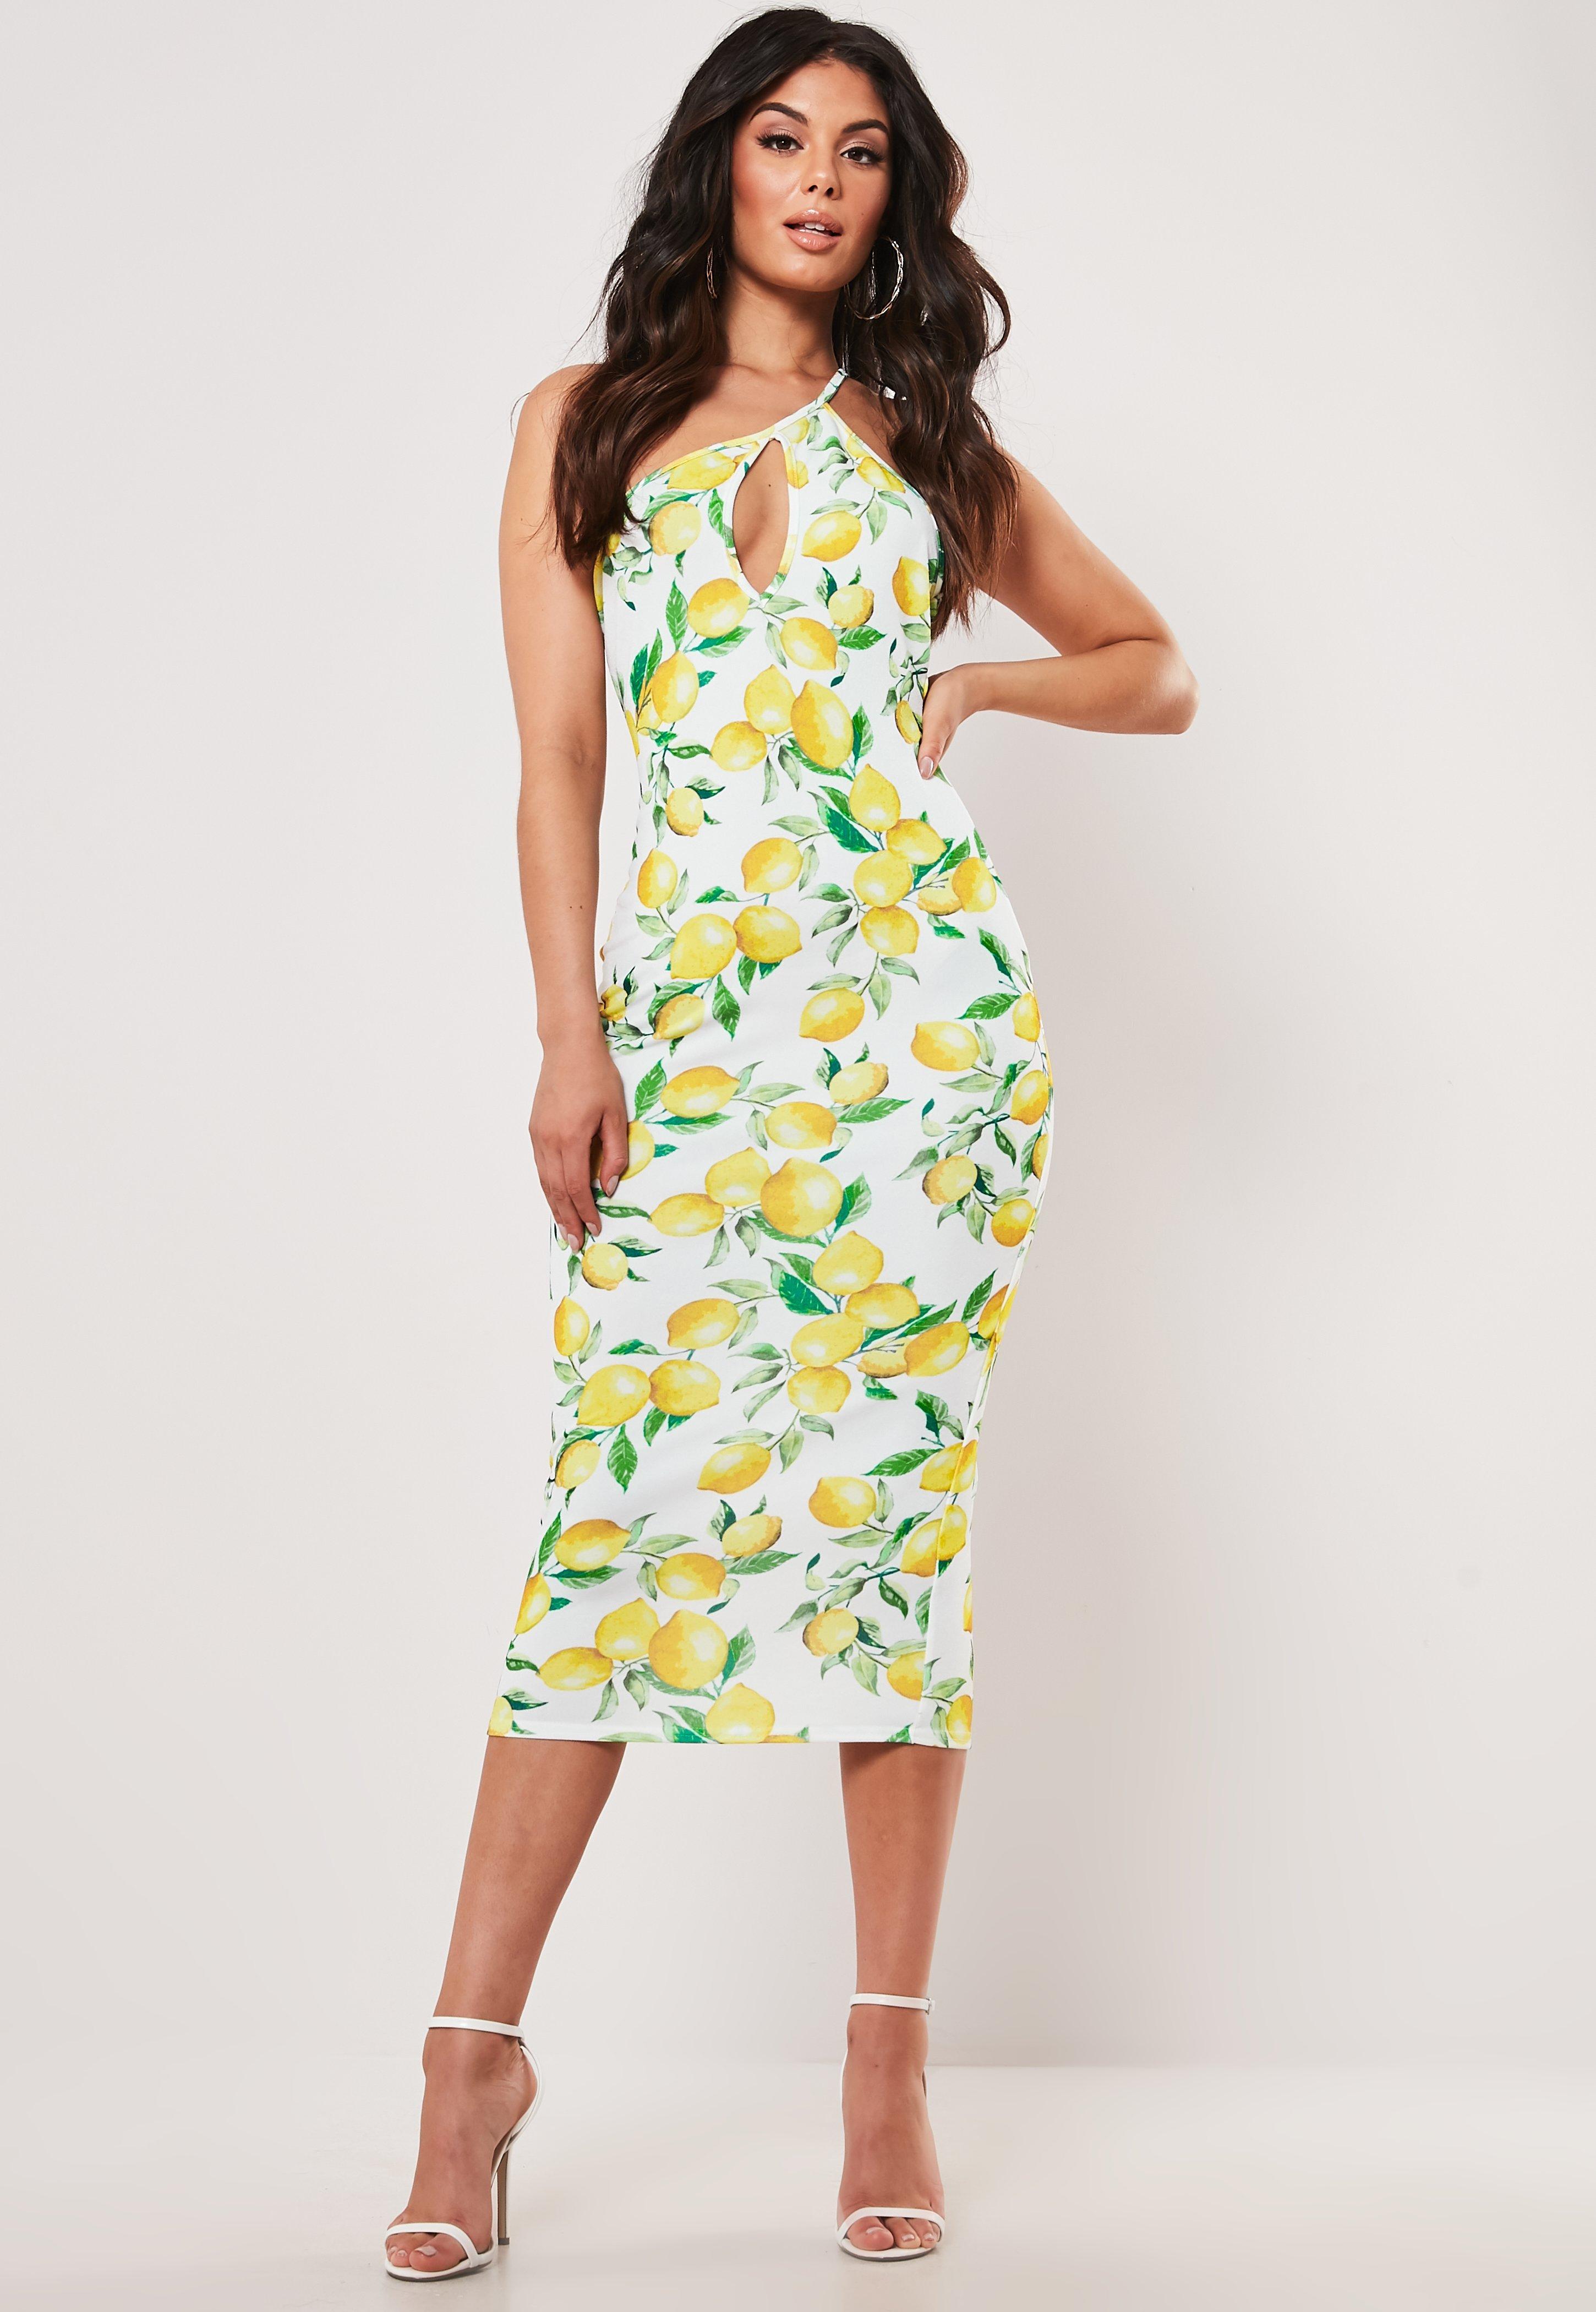 457b9ebbb00b One Shoulder Dresses- Shop One Sleeve Dresses | Missguided